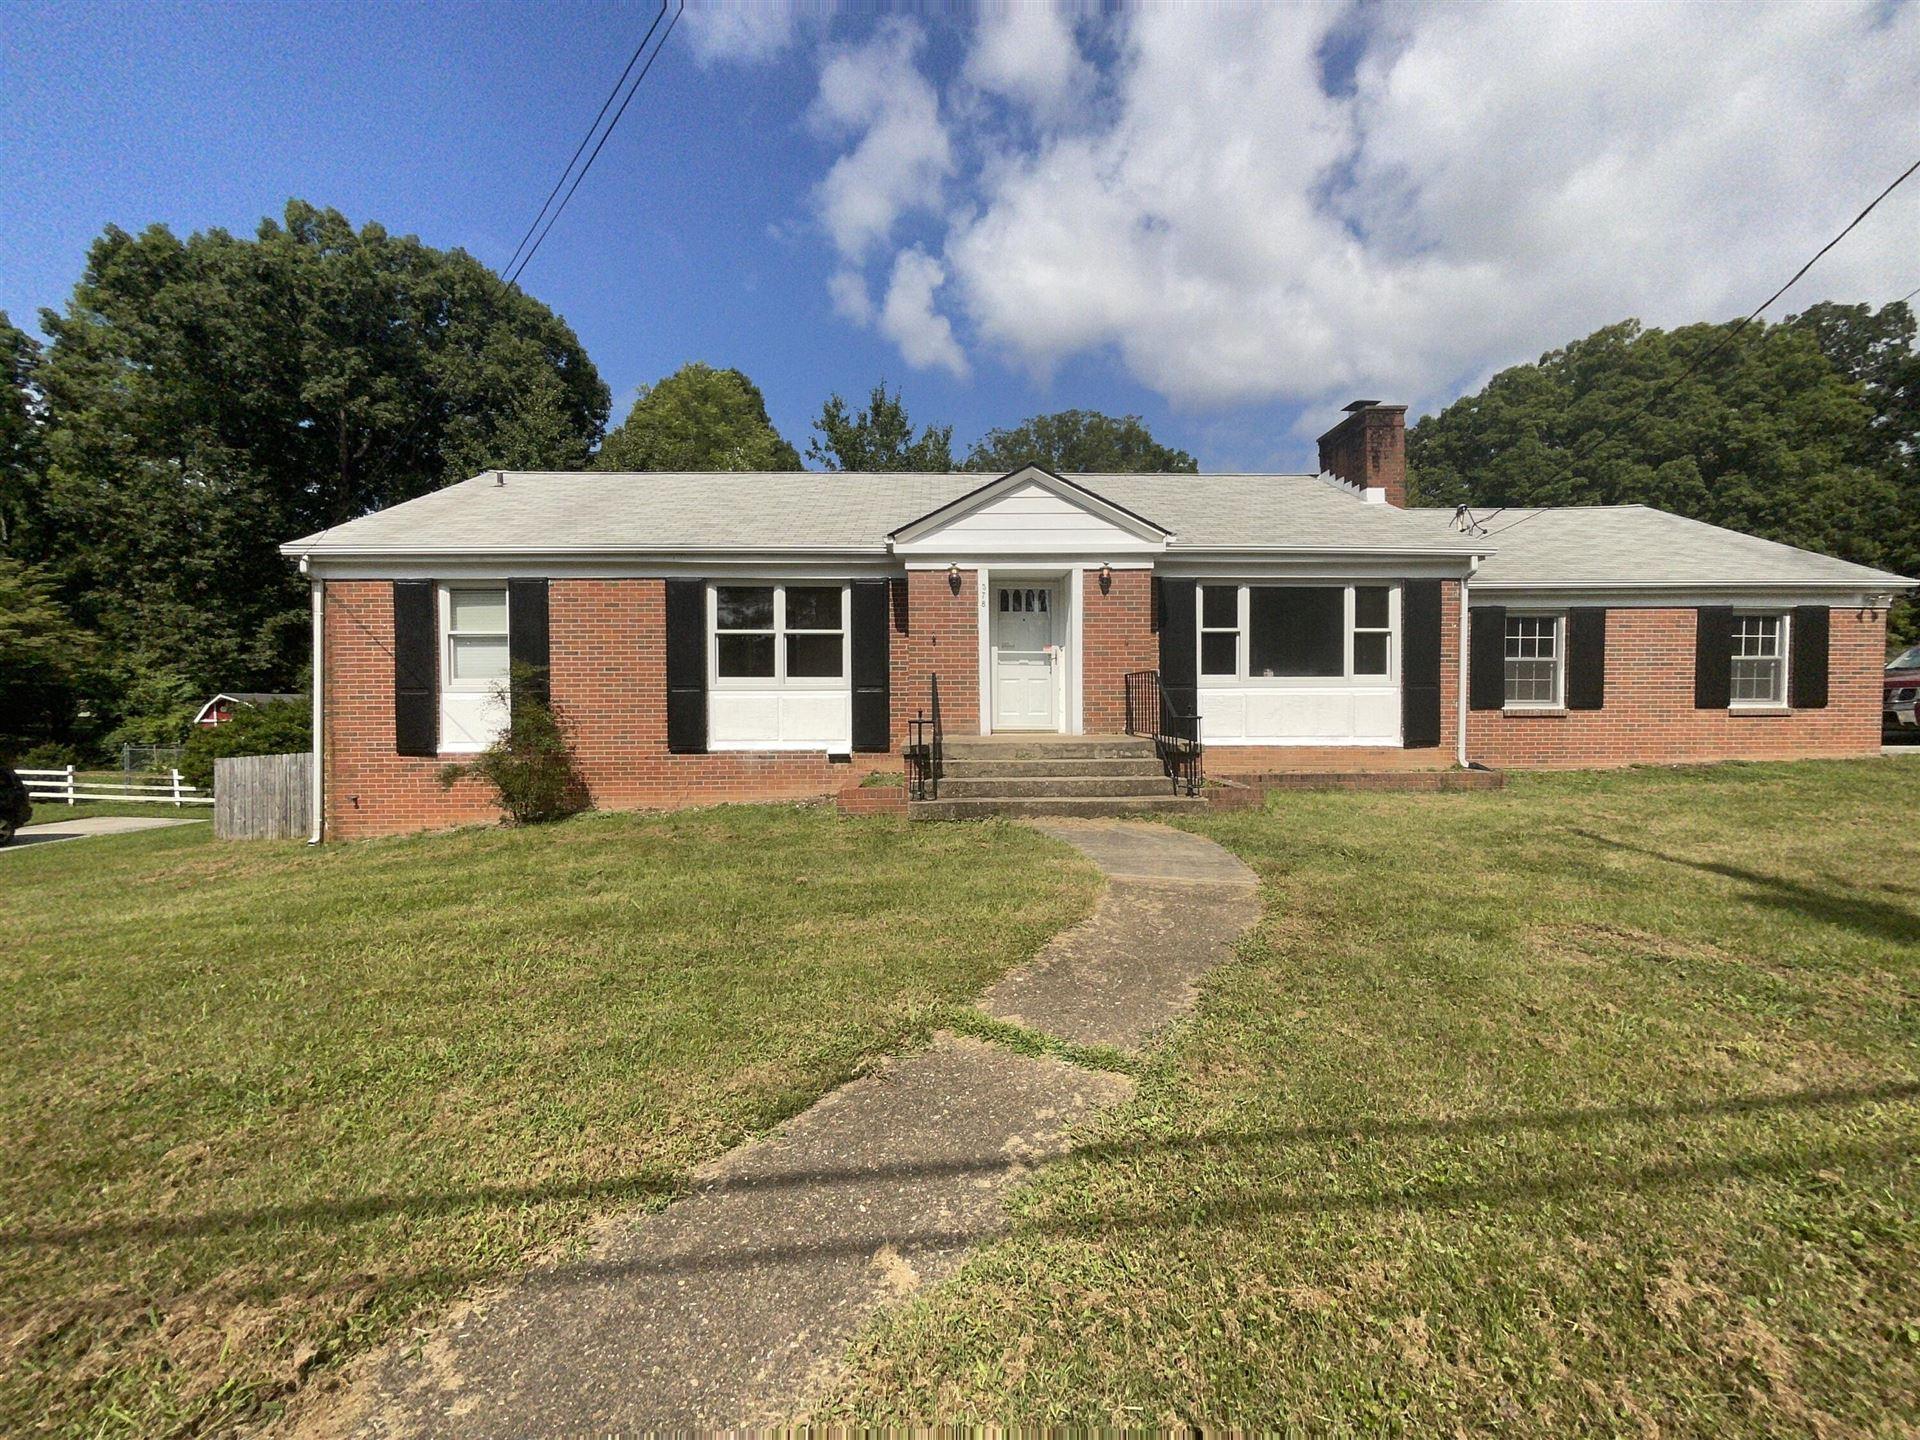 Photo of 378 East Drive, Oak Ridge, TN 37830 (MLS # 1168437)